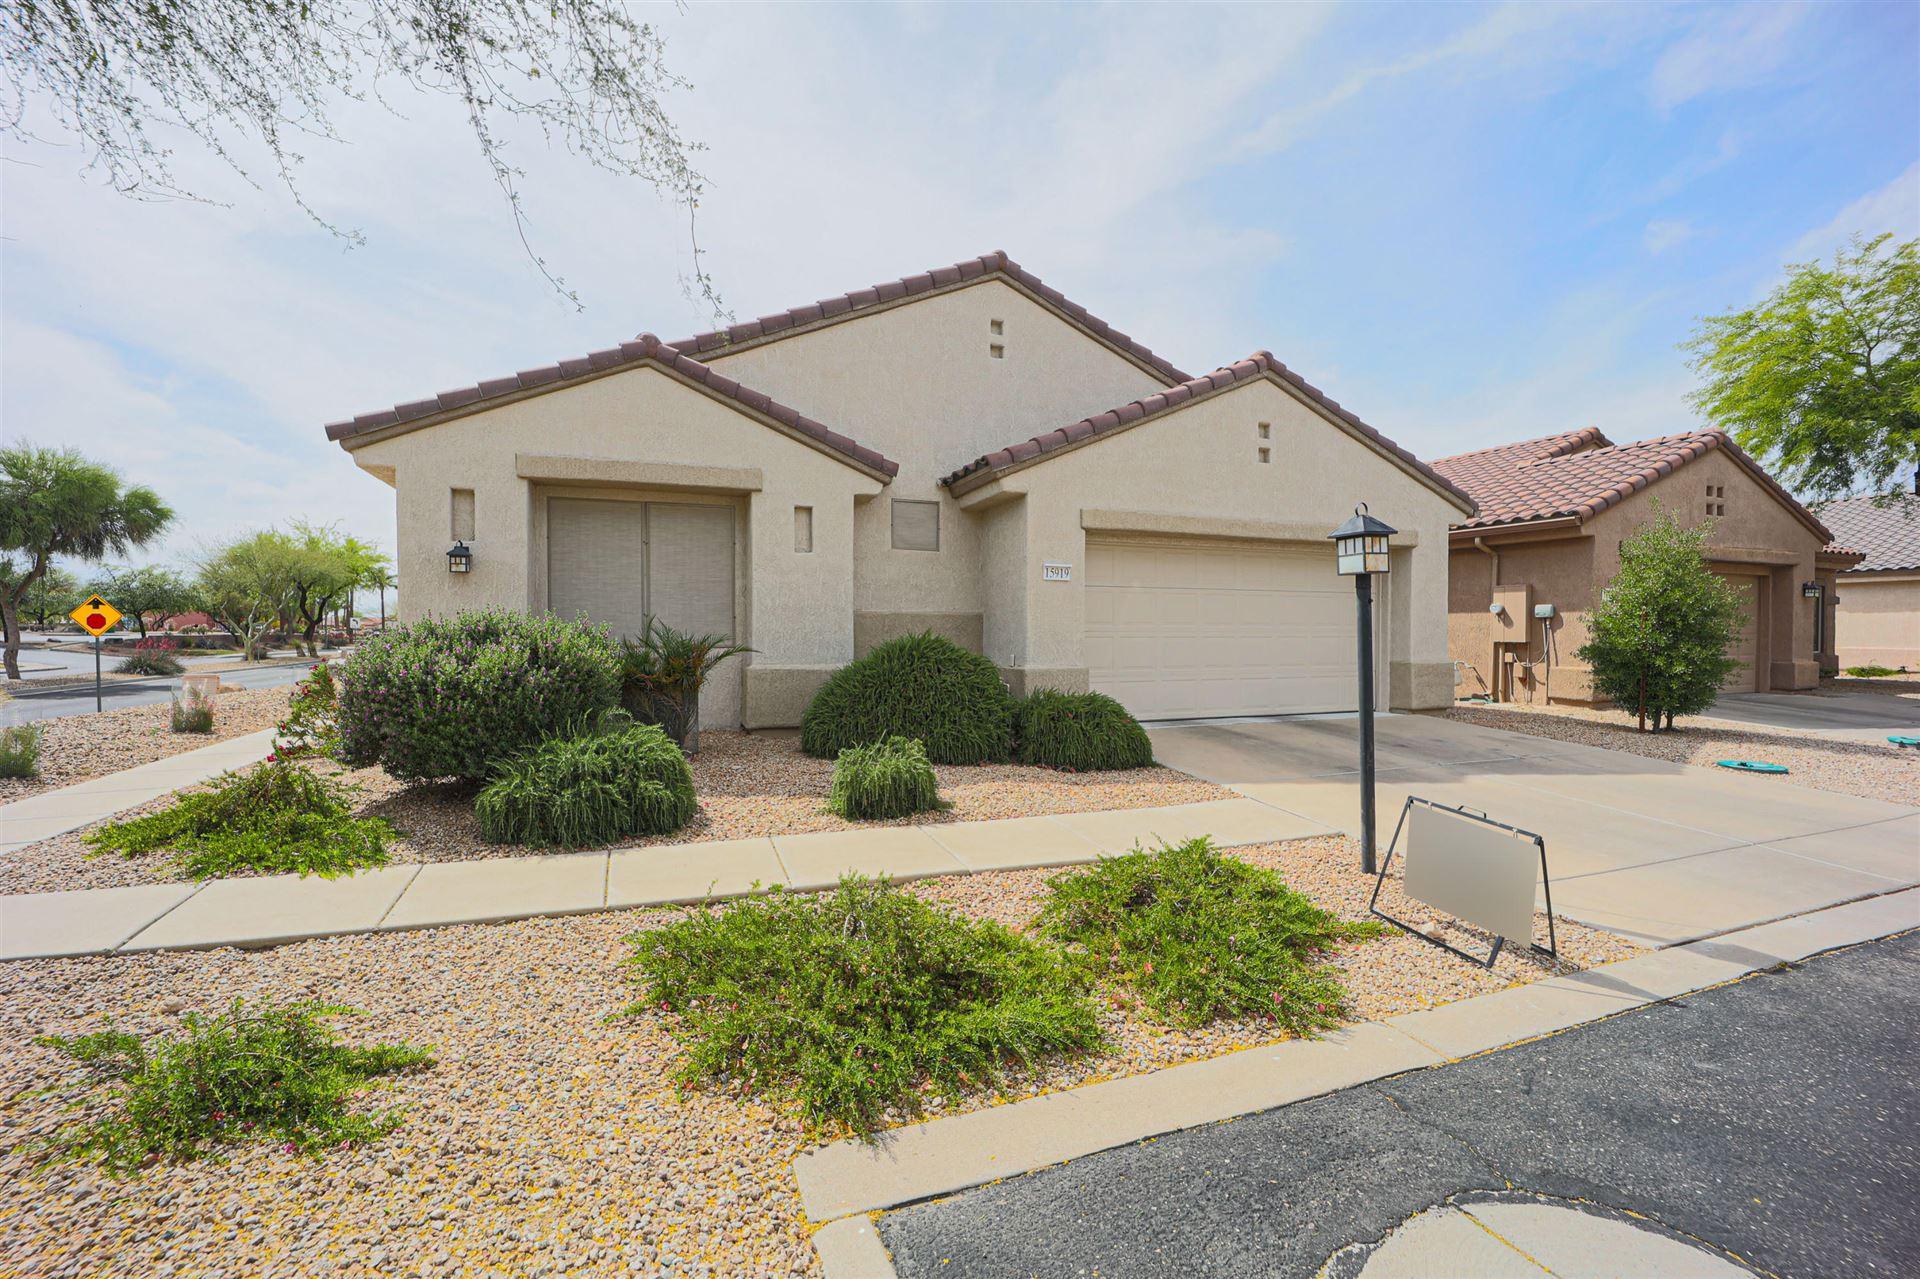 15919 W Sunstone Lane, Surprise, AZ 85374 - MLS#: 6225473